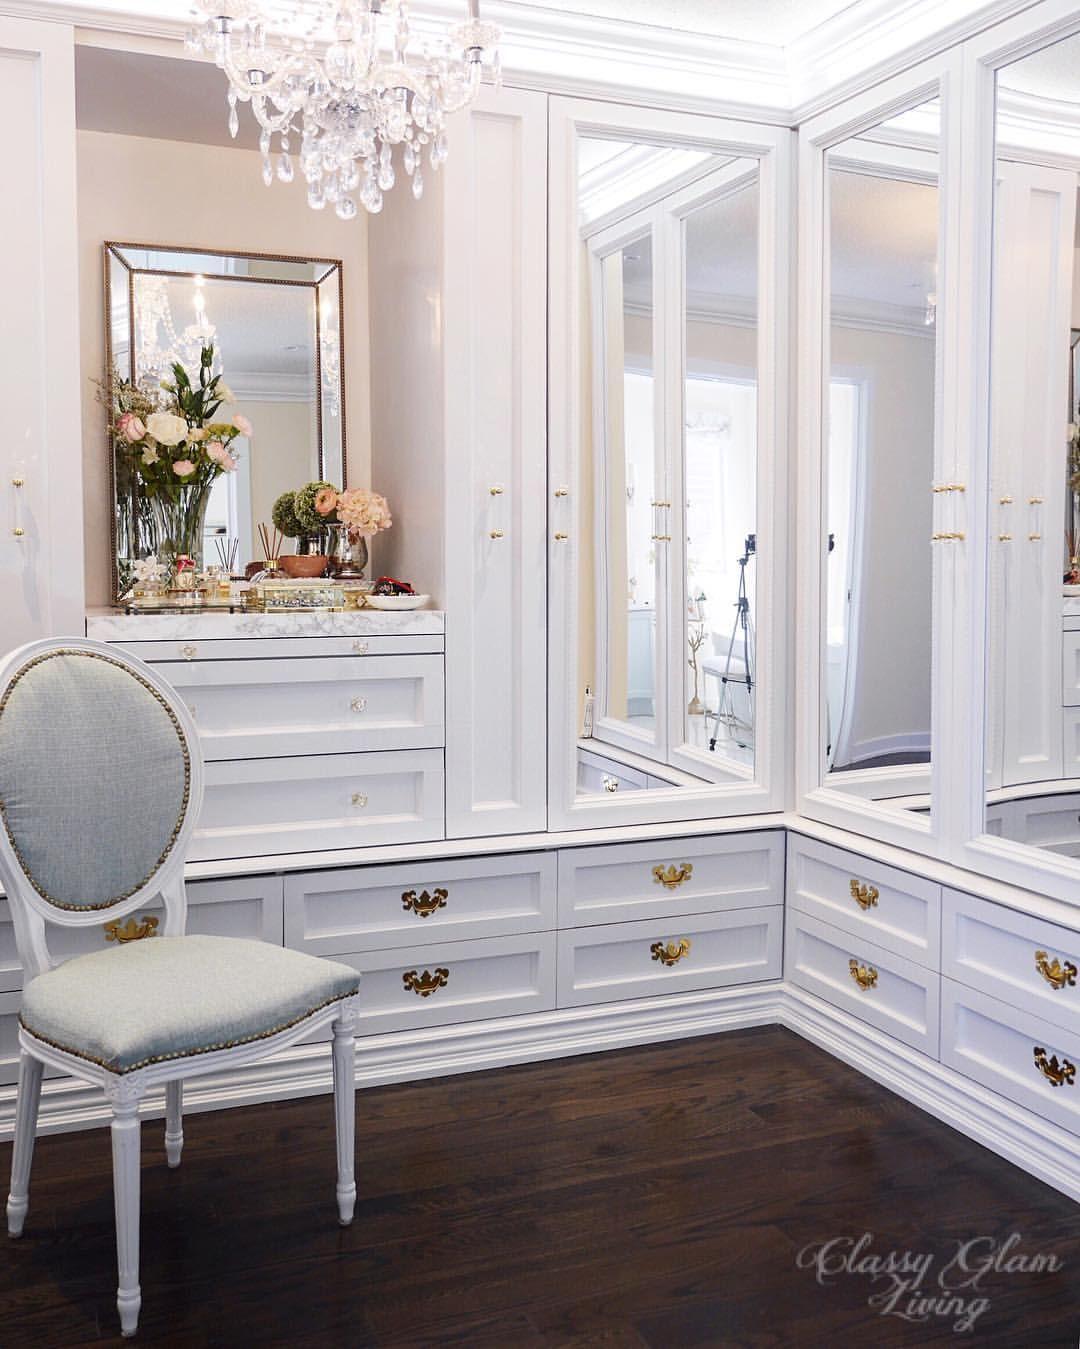 Dressing room walk-in closet mirror cabinet doors closet drawers ...